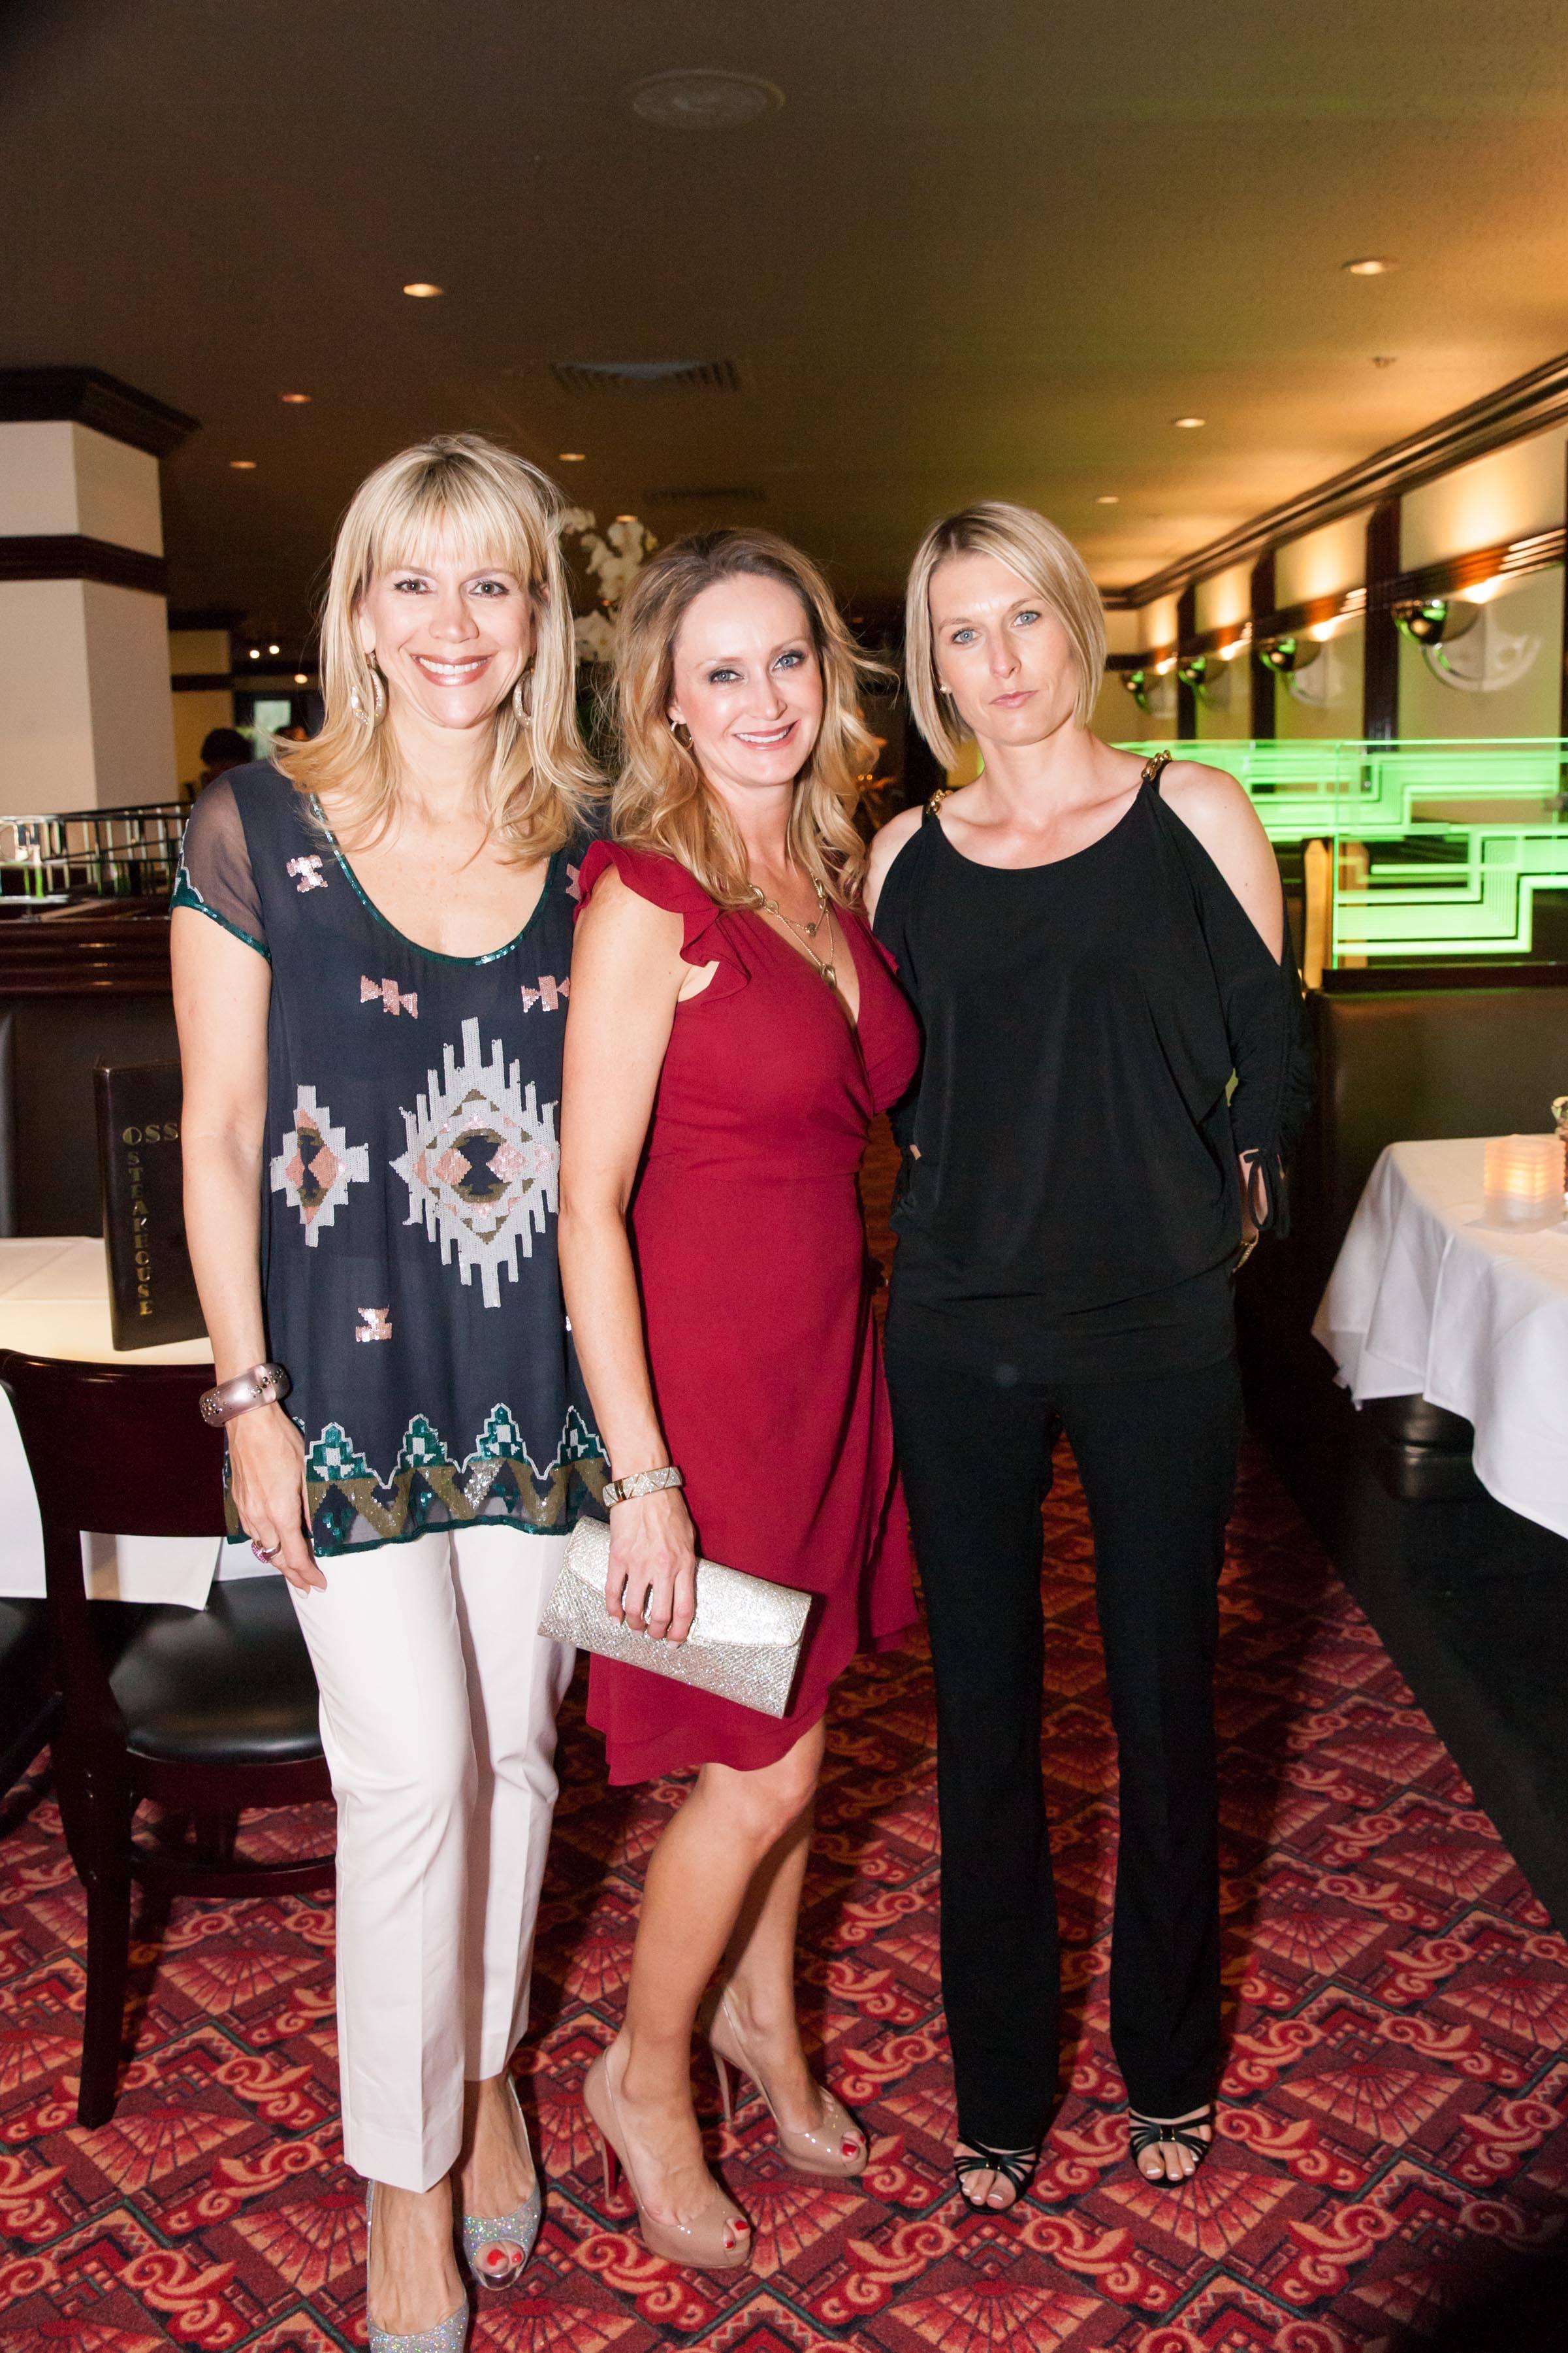 Kimberly Sharpe, Yvette Carmignani, Olga Pawlowicz